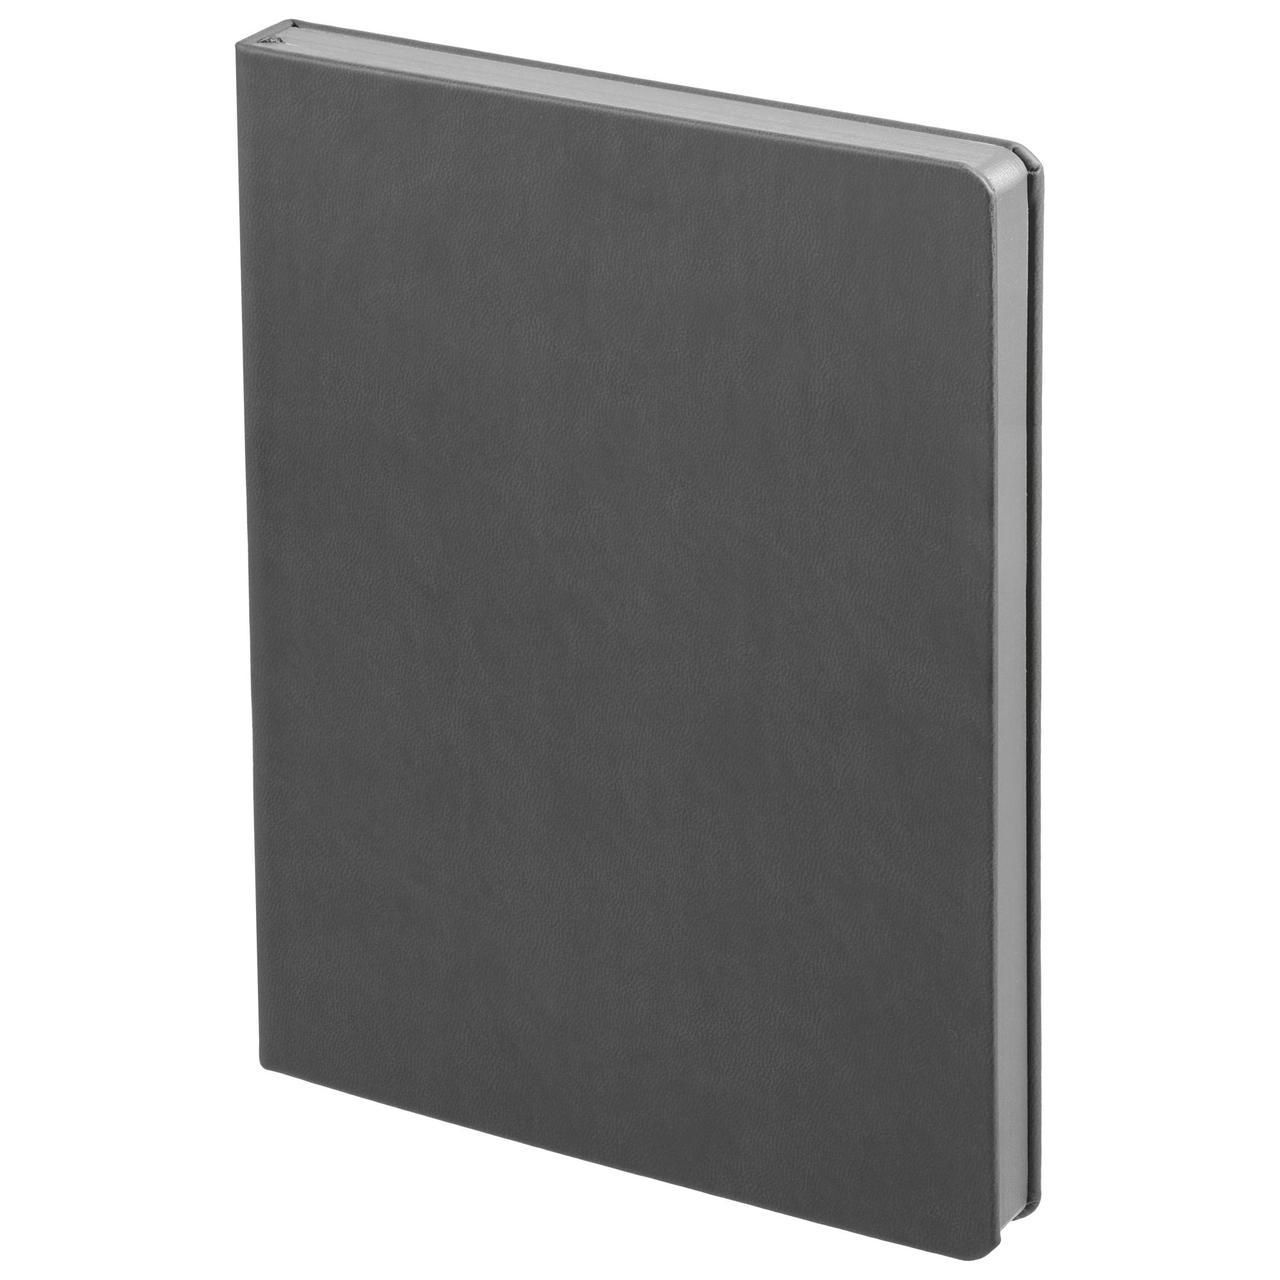 Ежедневник Brand Tone, недатированный, темно-серый (артикул 17882.10)